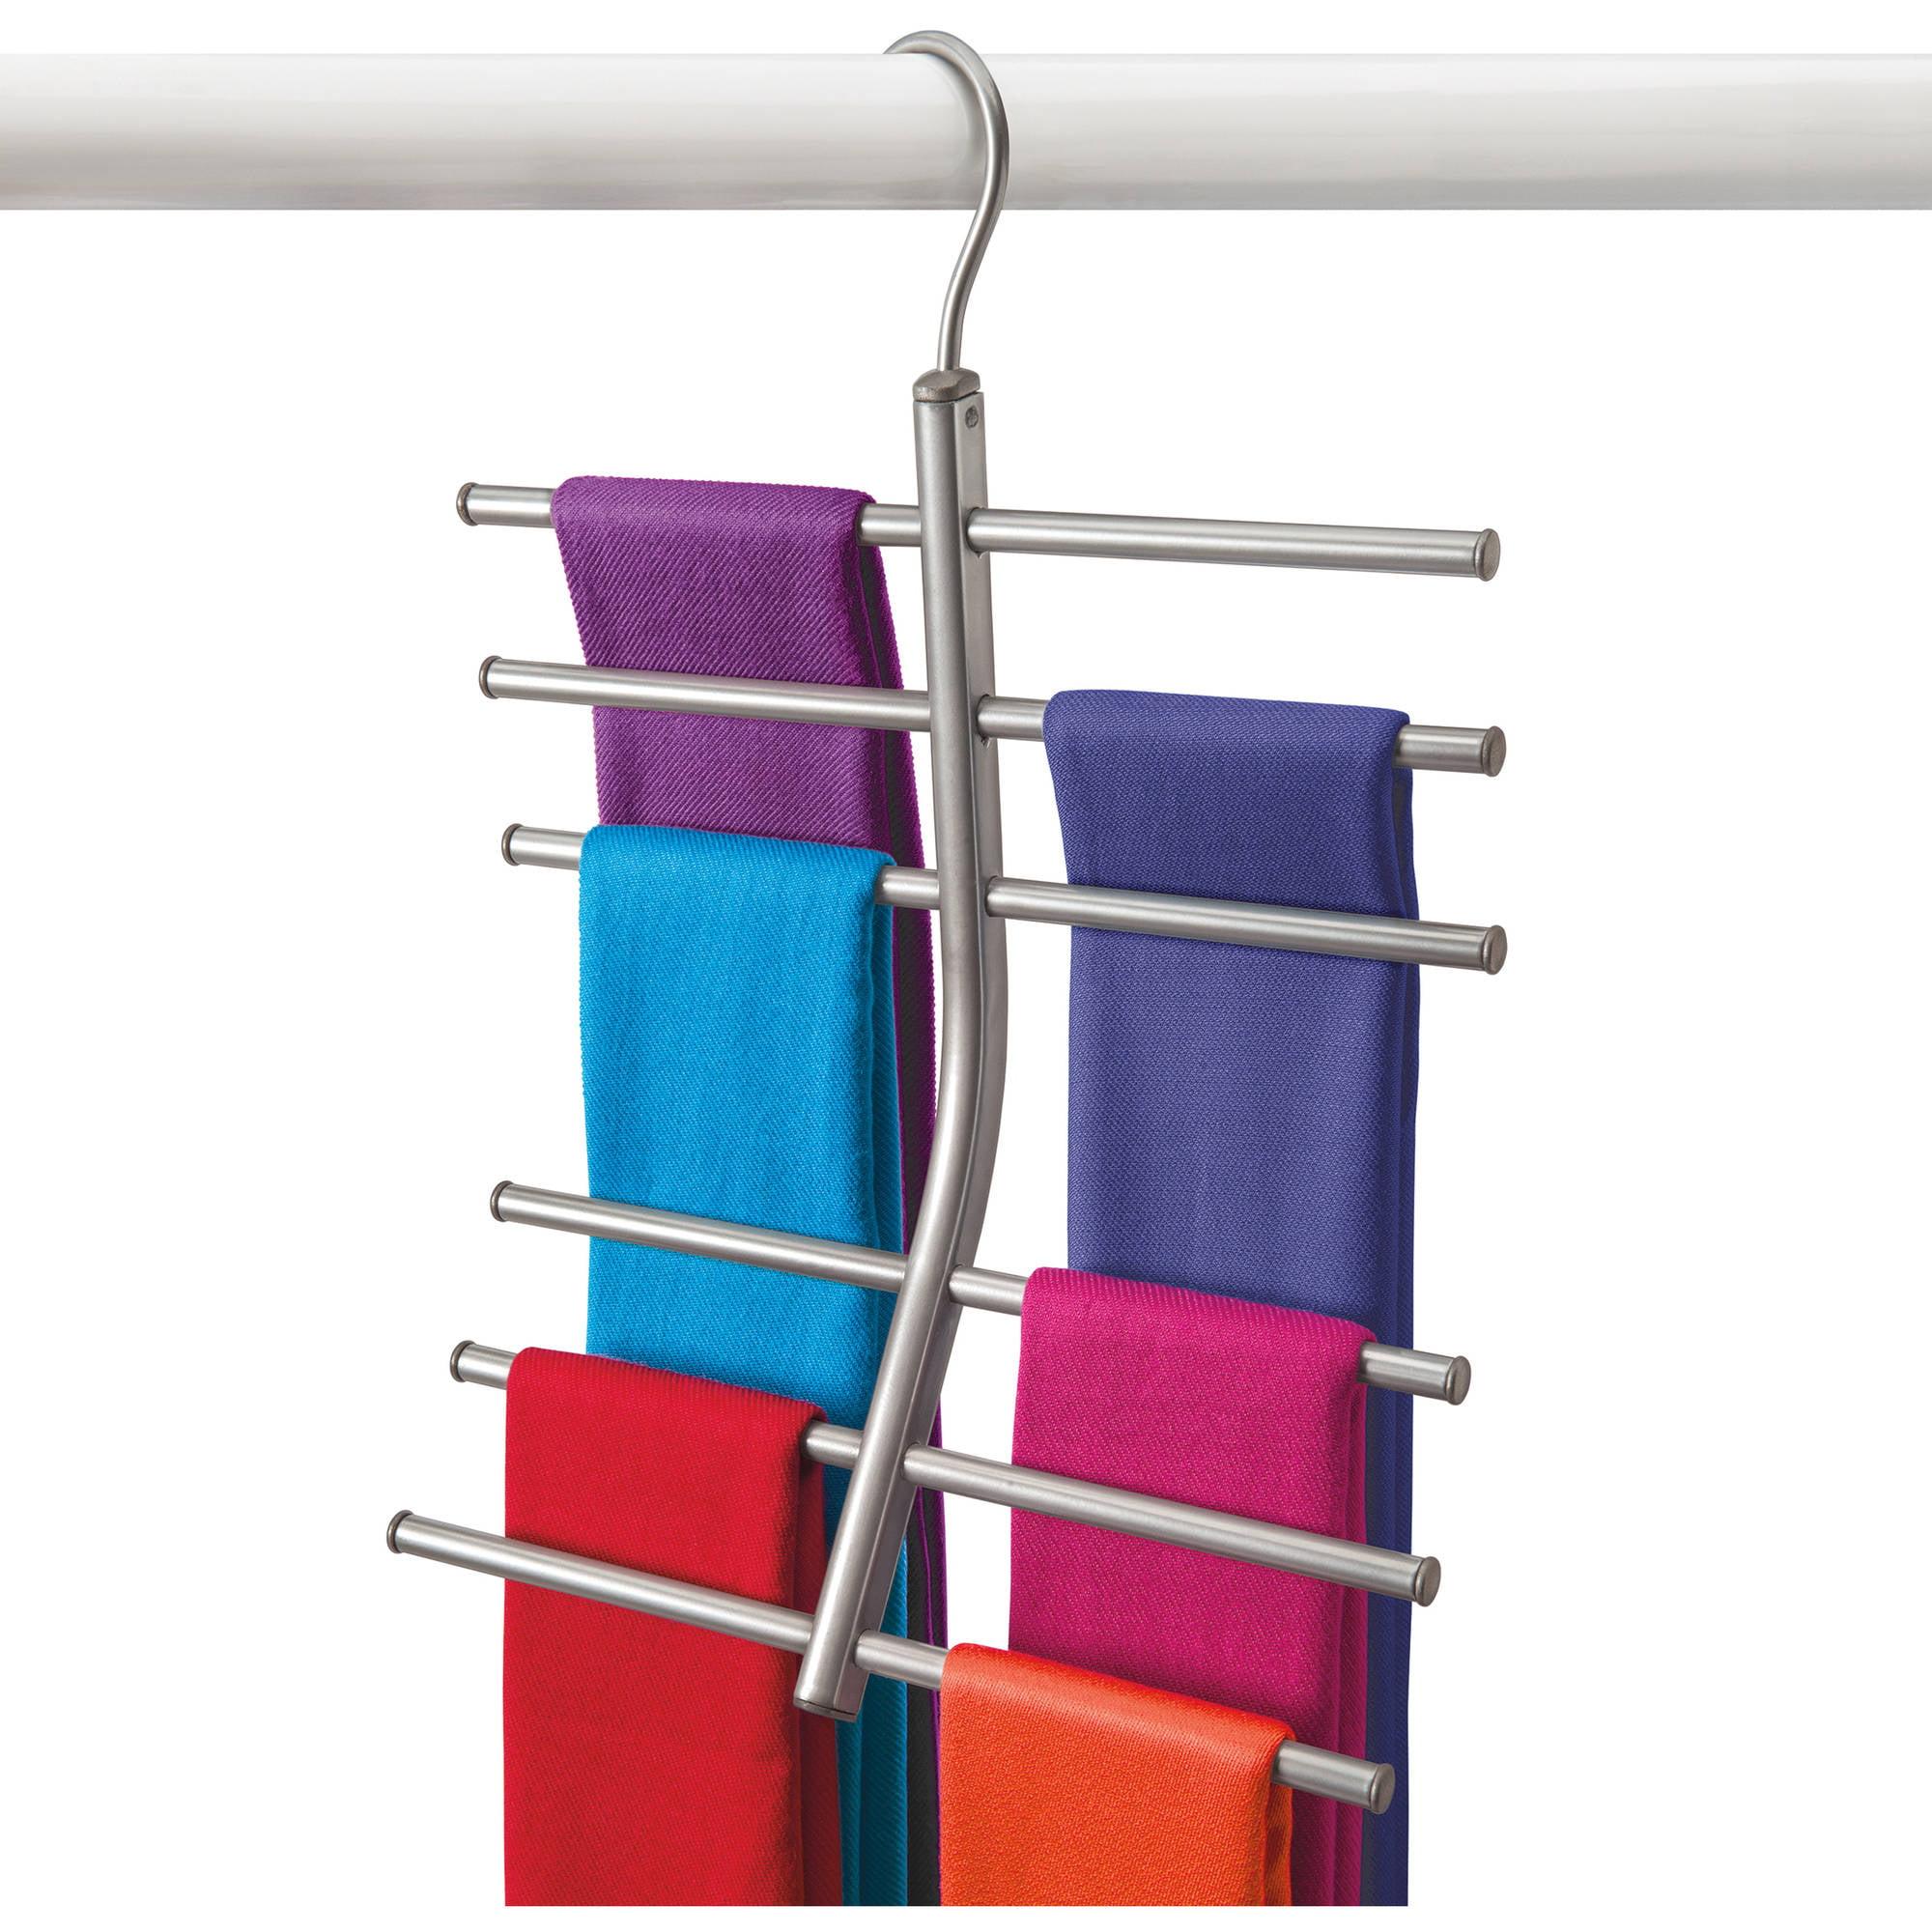 Lynk Hanging Tiered Scarf Holder, Closet Hanger, Organizer Rack, Platinum